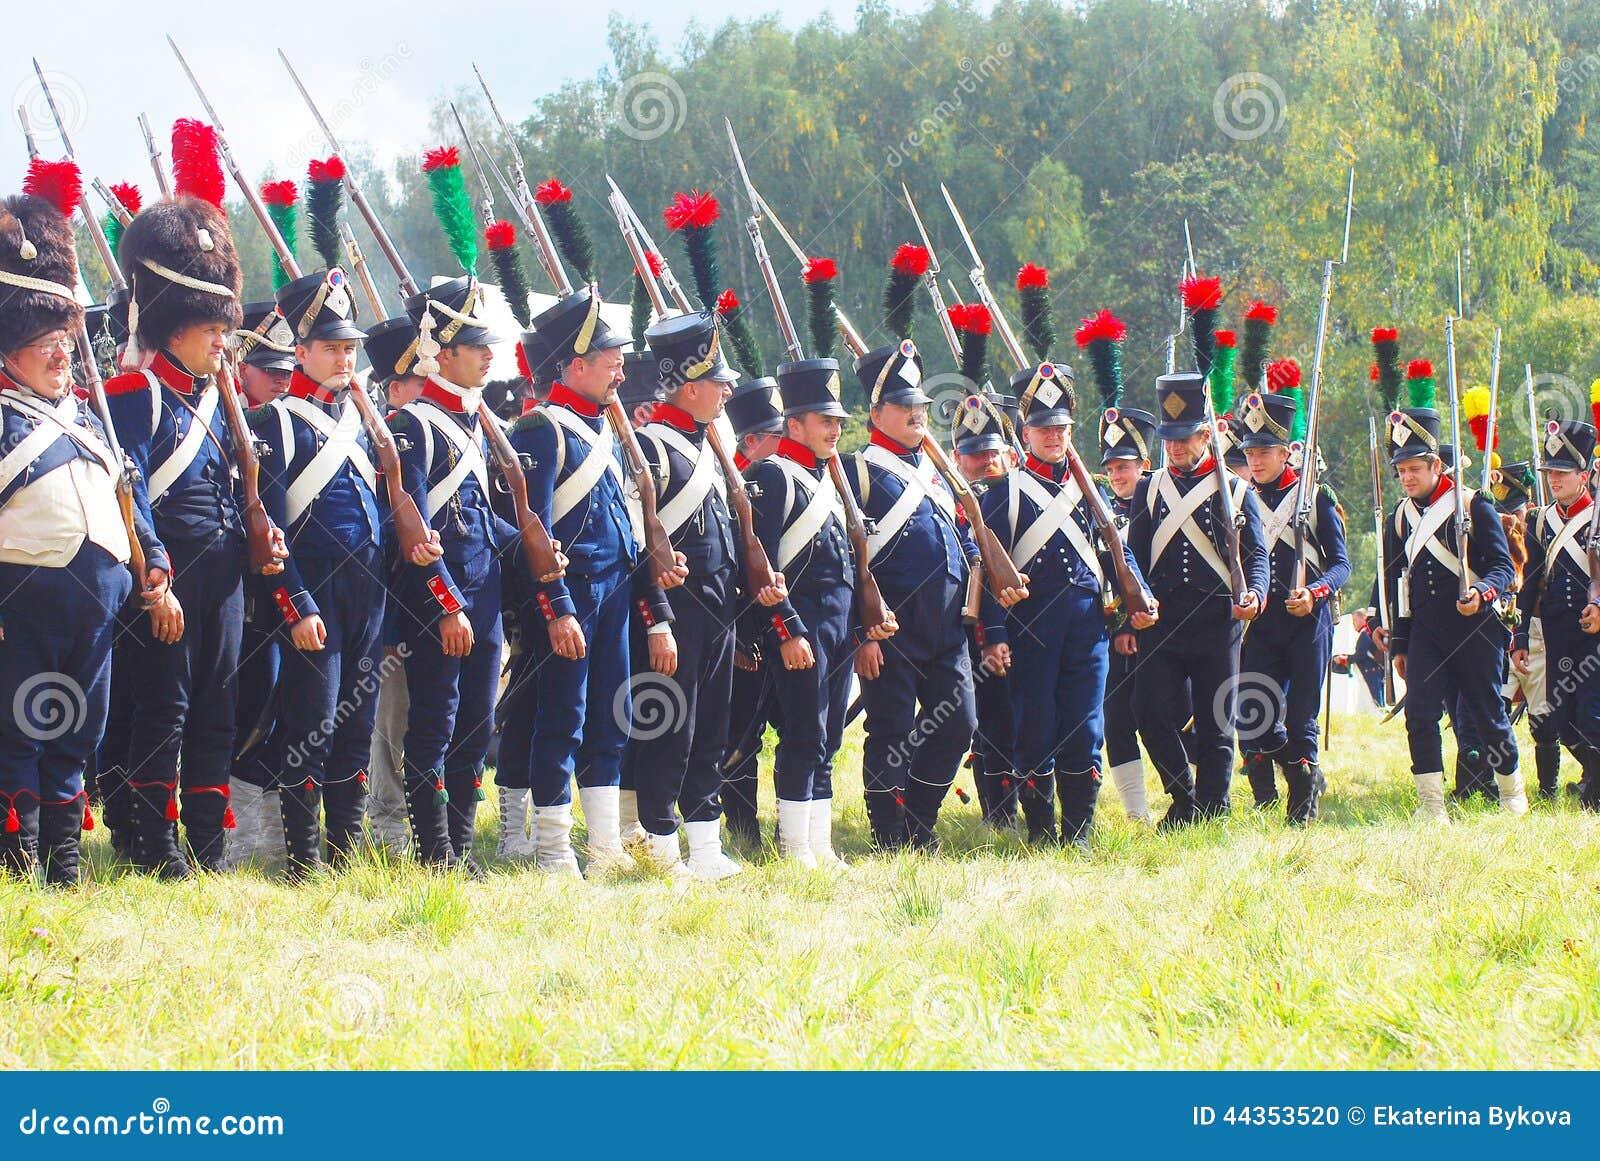 Un gruppo di soldati-reenactors (napoleonici) francesi